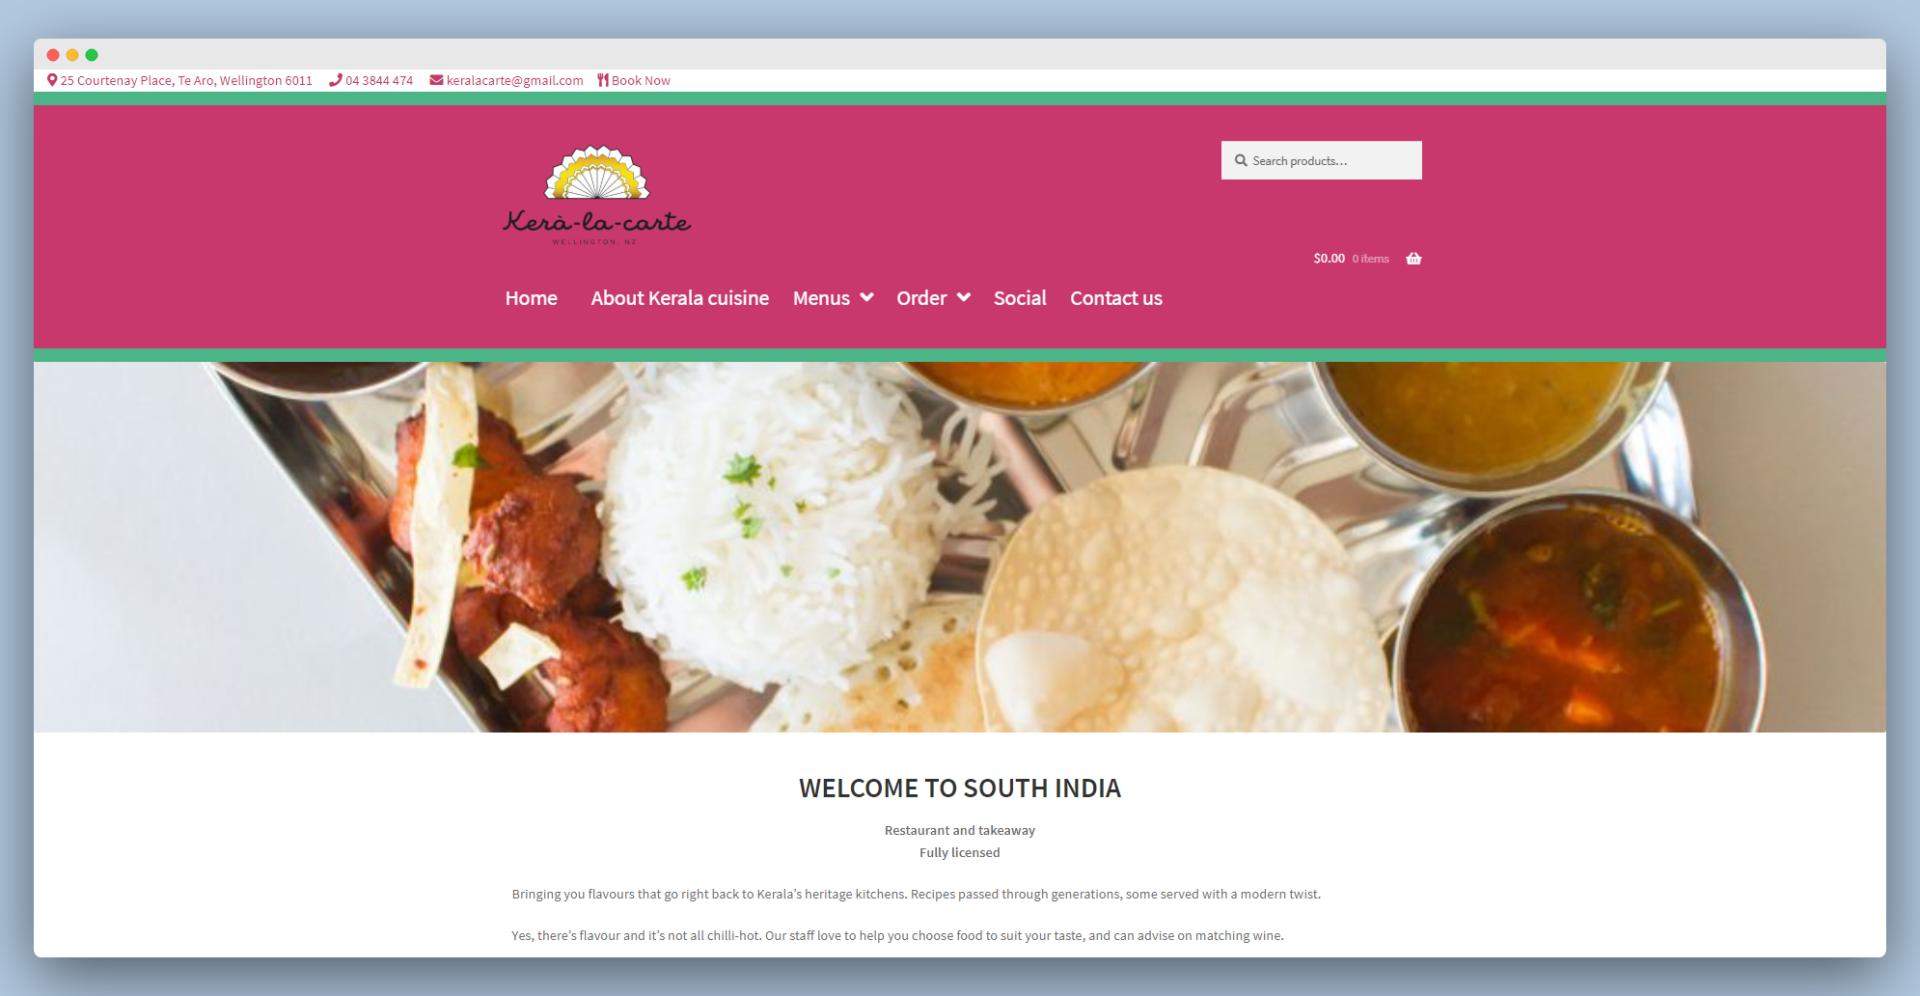 screenshot of the Kera-la-carte website